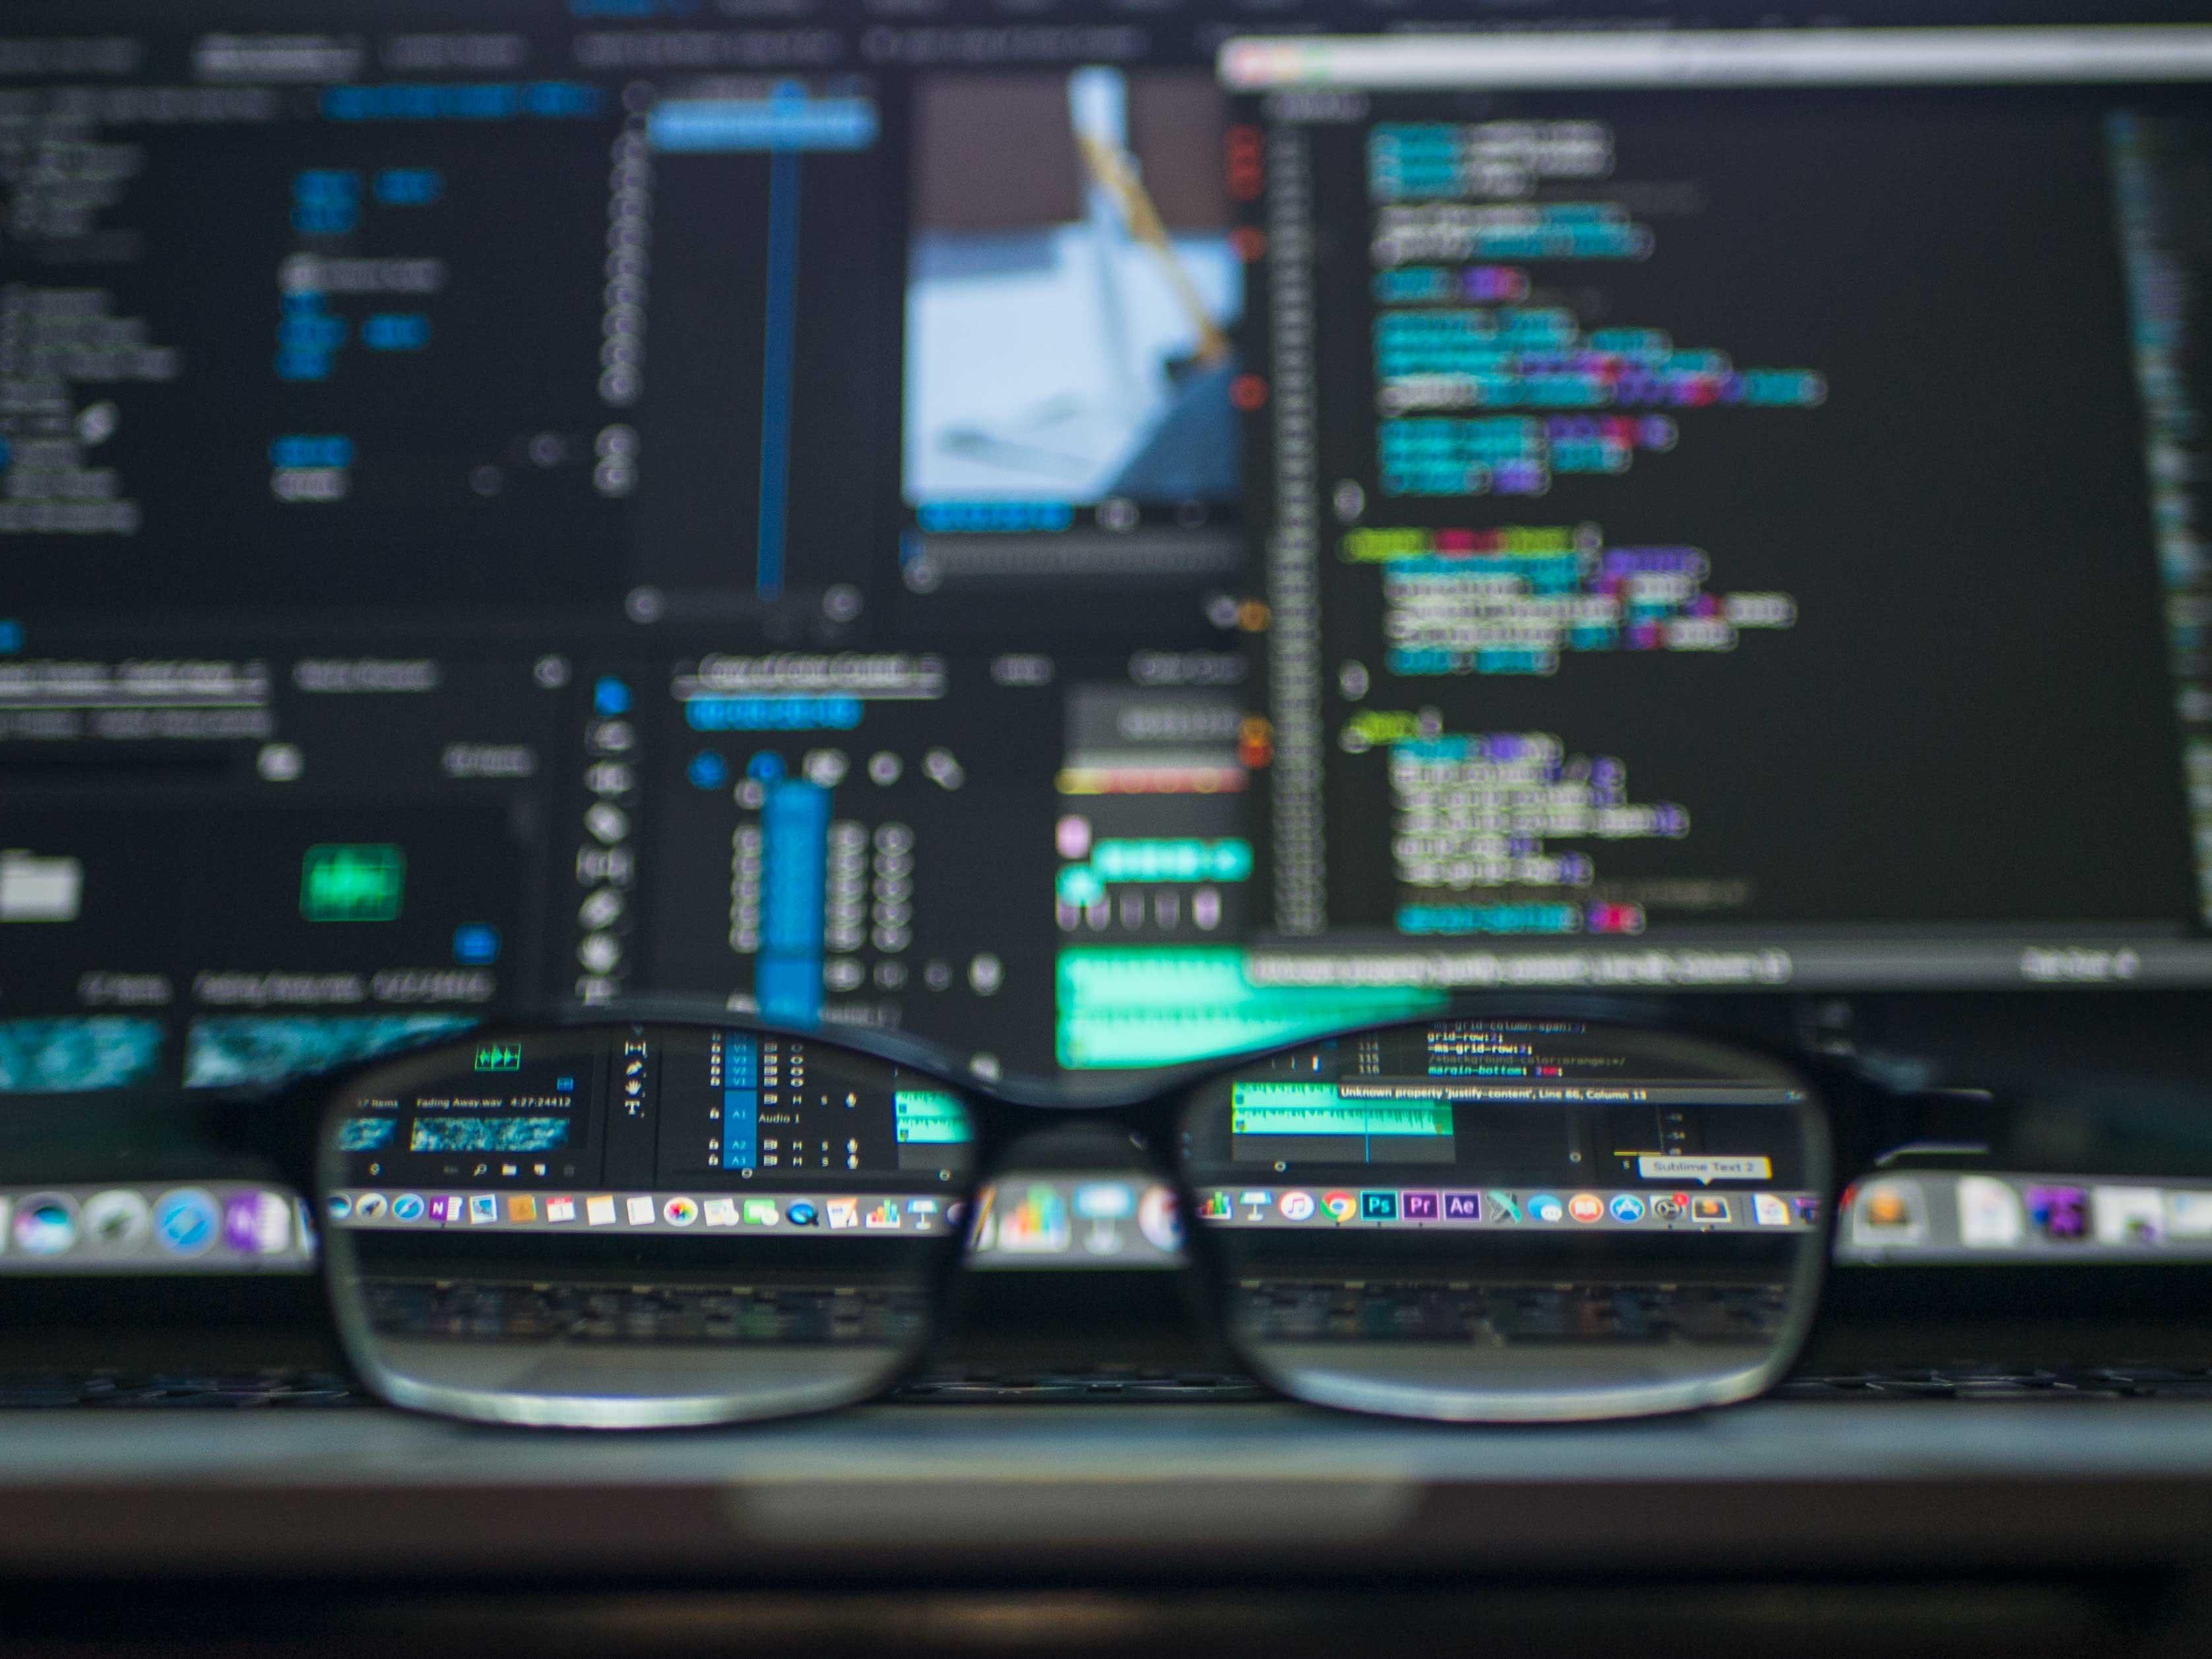 business website data viewed on a computer